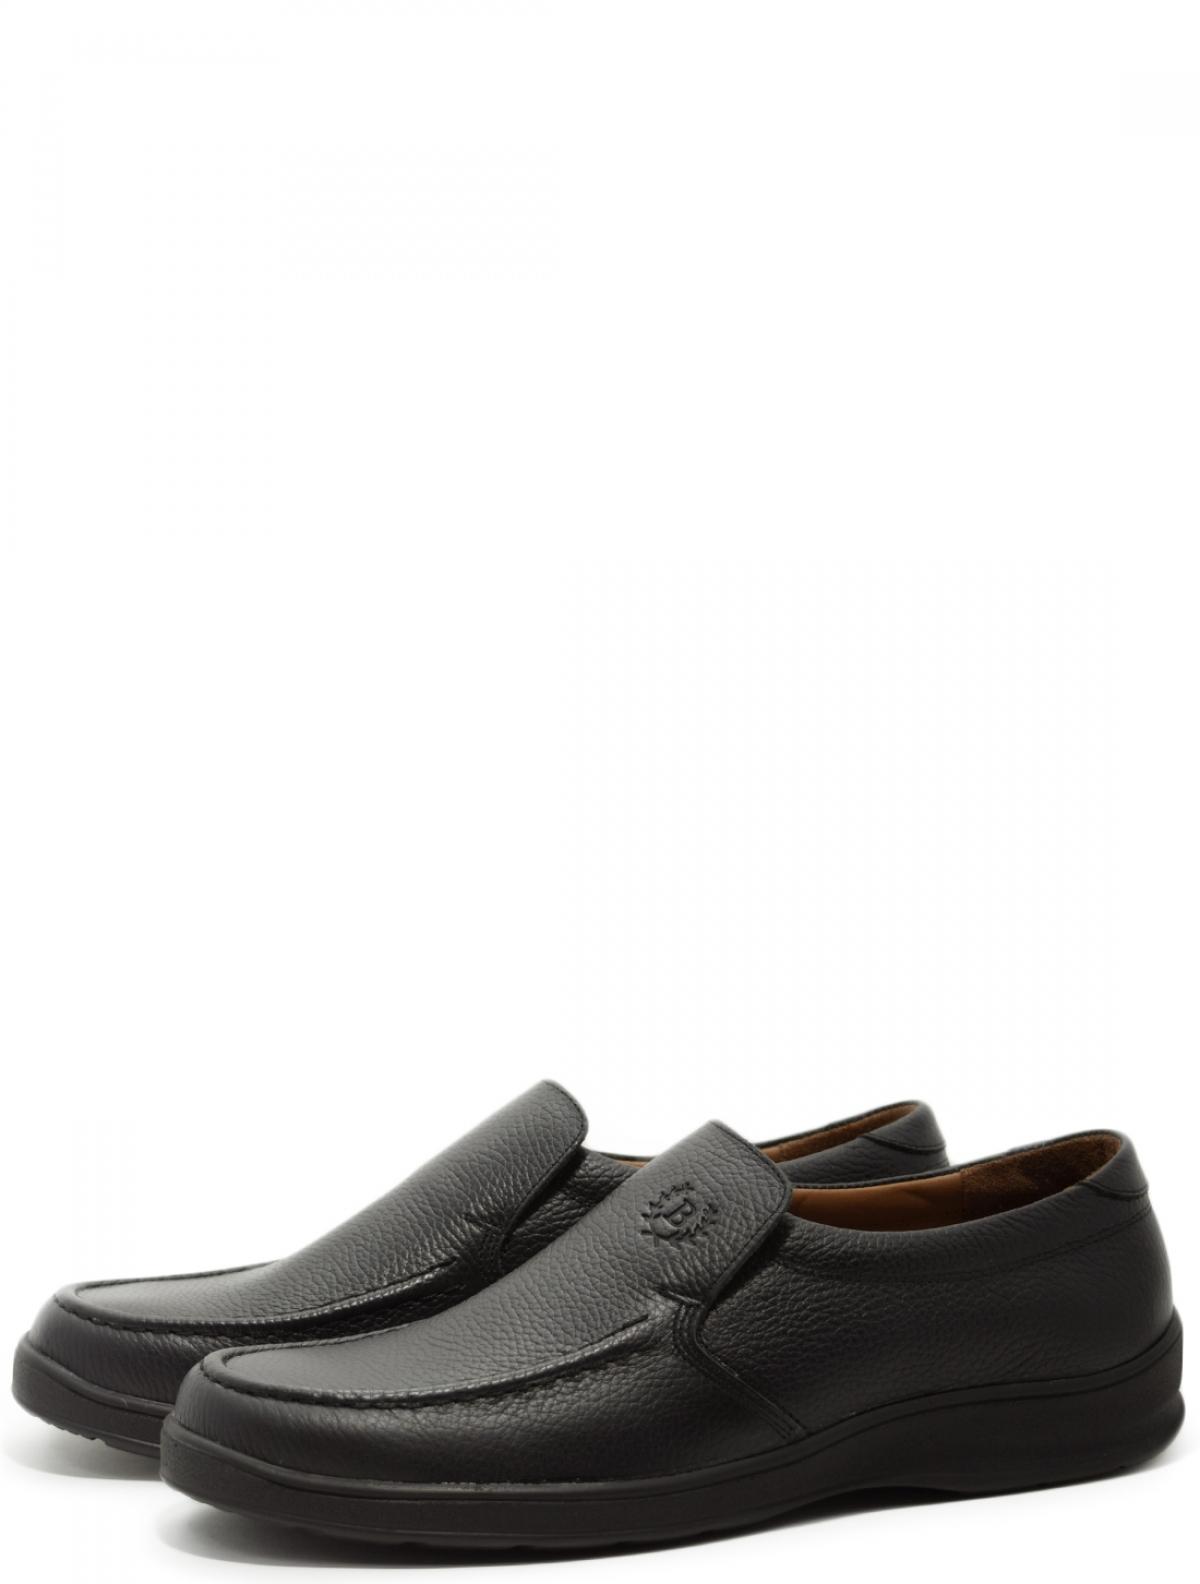 Bossner 1-350-101-1 мужские туфли